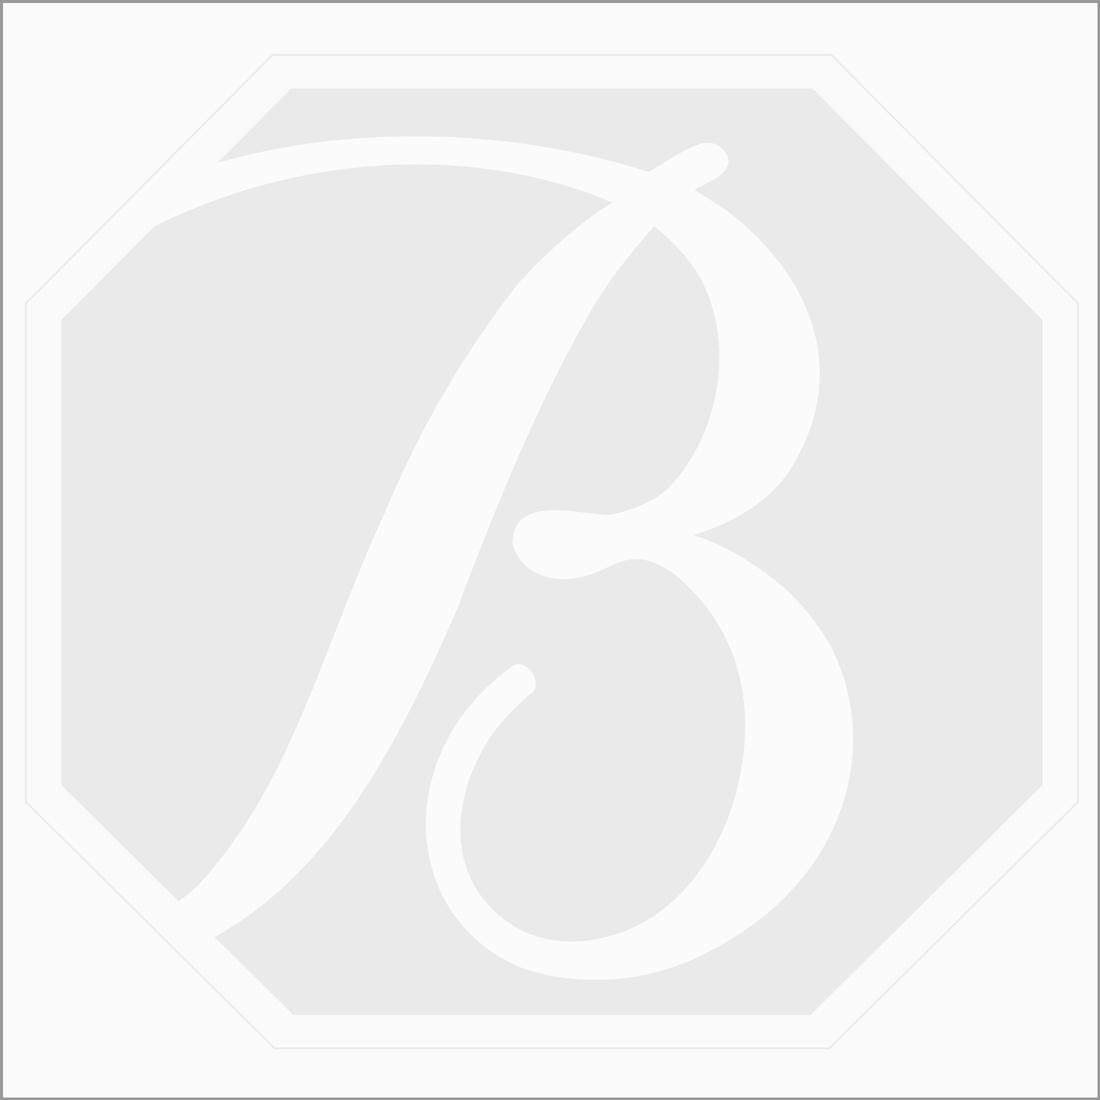 0.71 ct. Oval (E-SI1) White Rose Cut Diamond Photograph